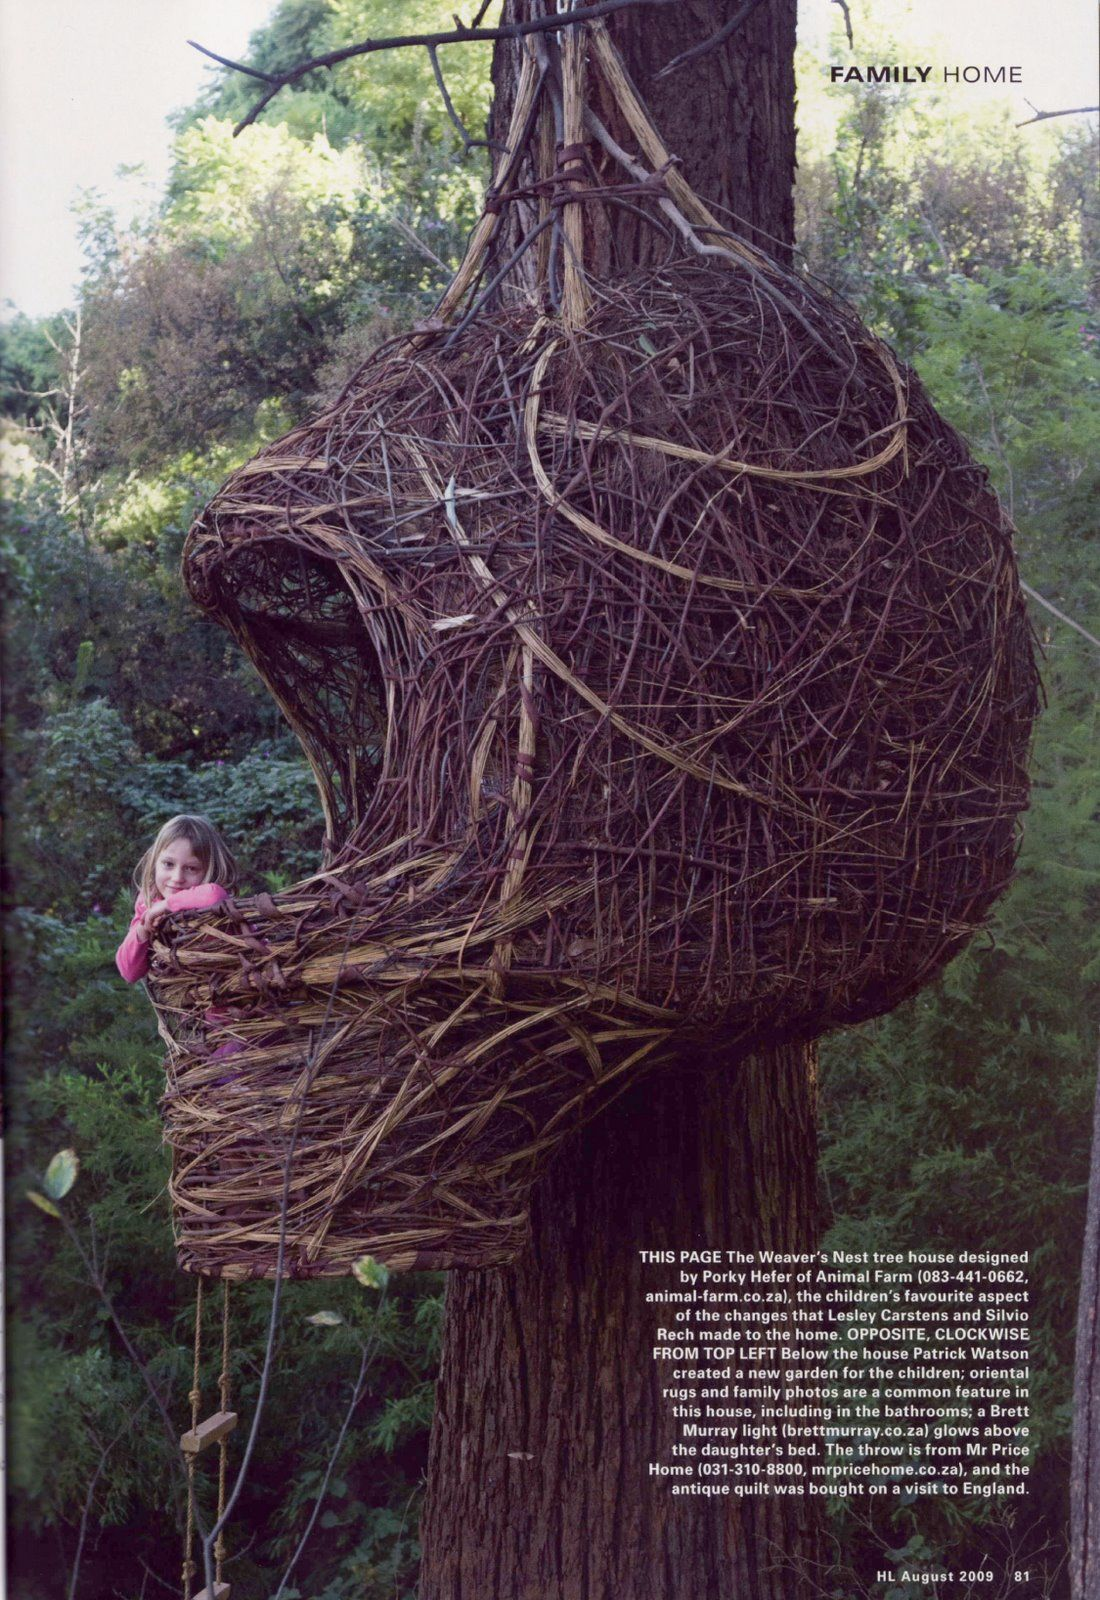 Animal Farm's amazing tree house